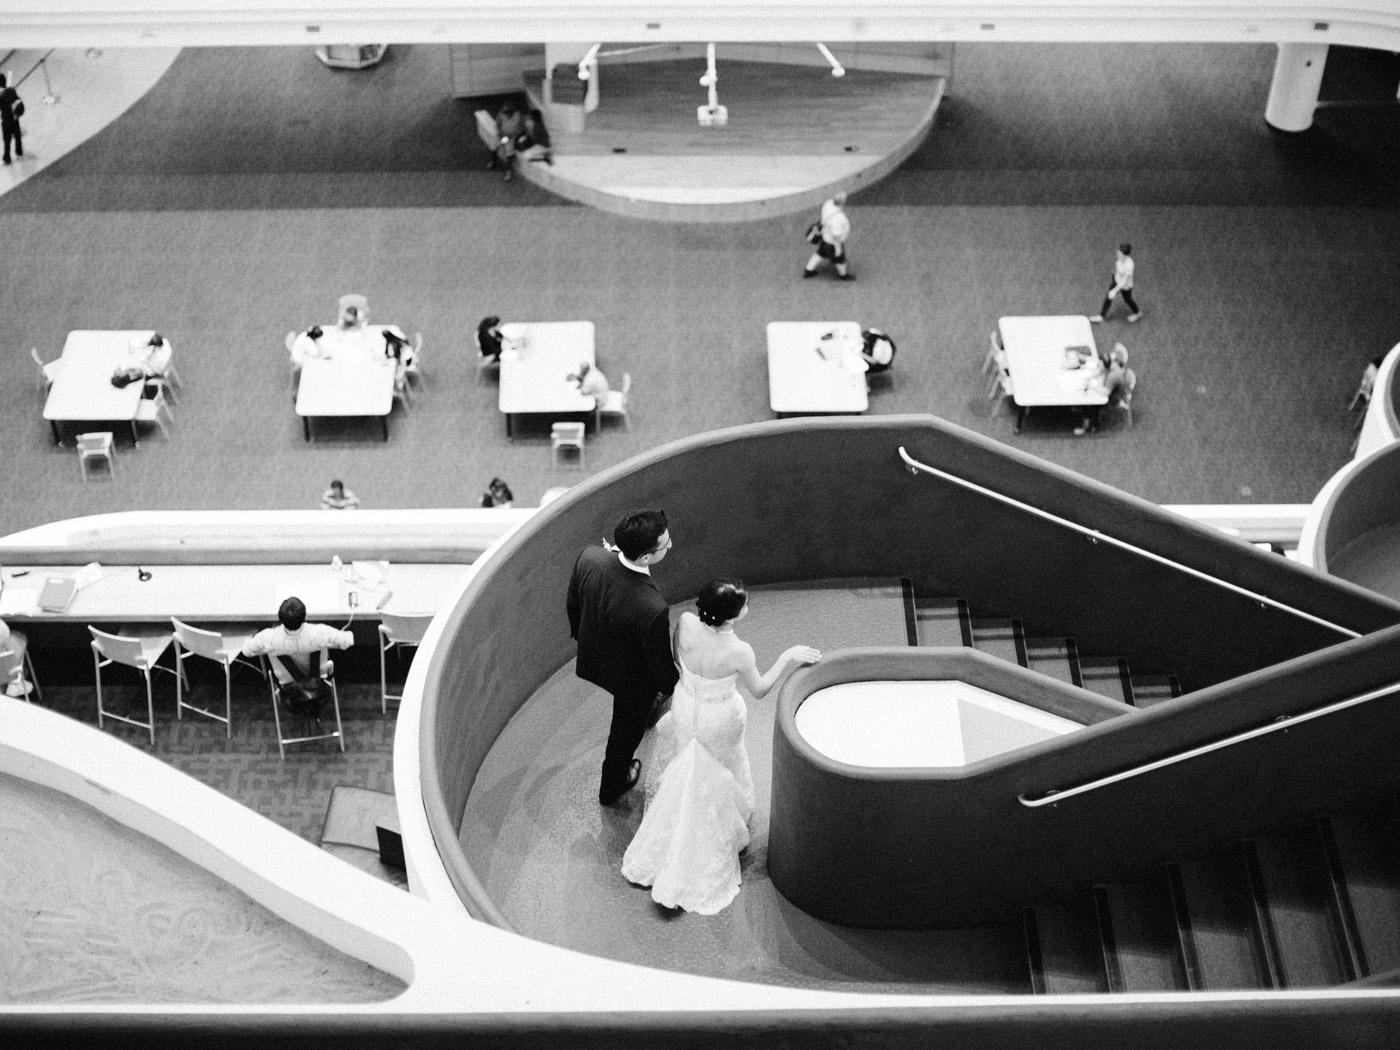 toronto_wedding_photographer_fine_art_documentary_photography-82.jpg